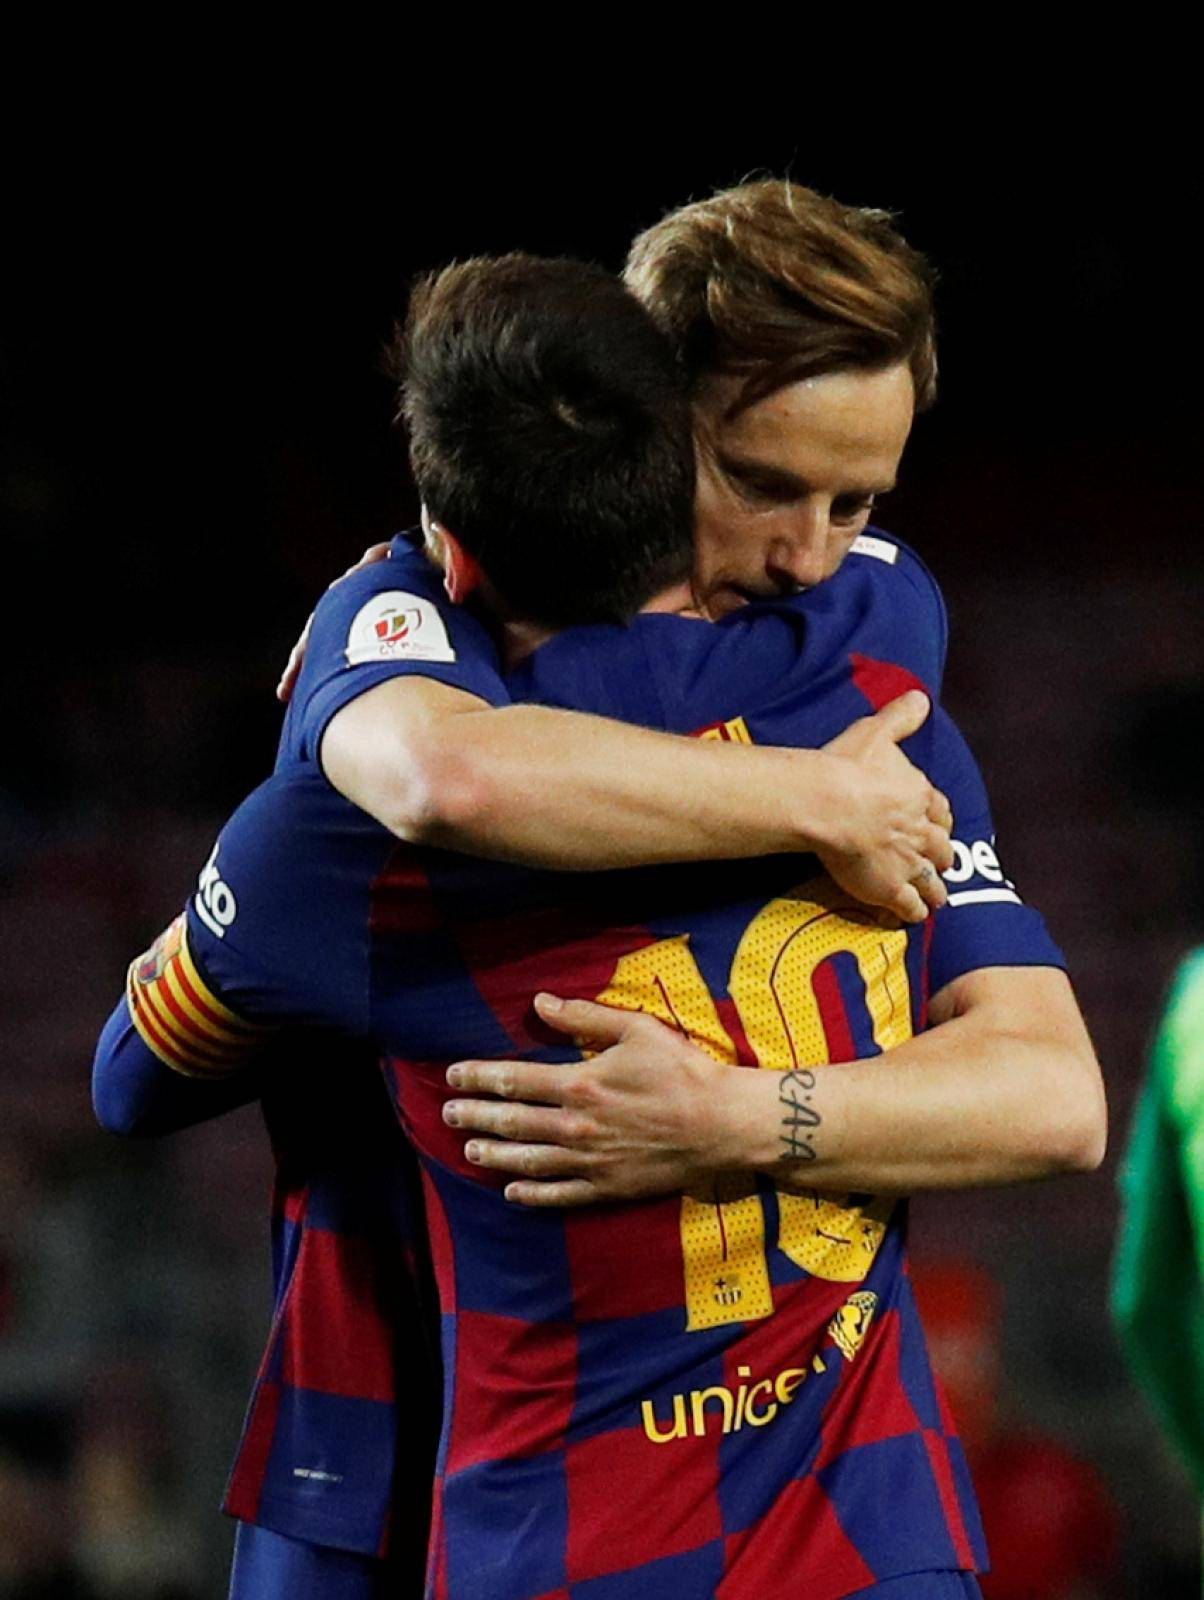 Copa del Rey - Round of 16 - FC Barcelona v Leganes